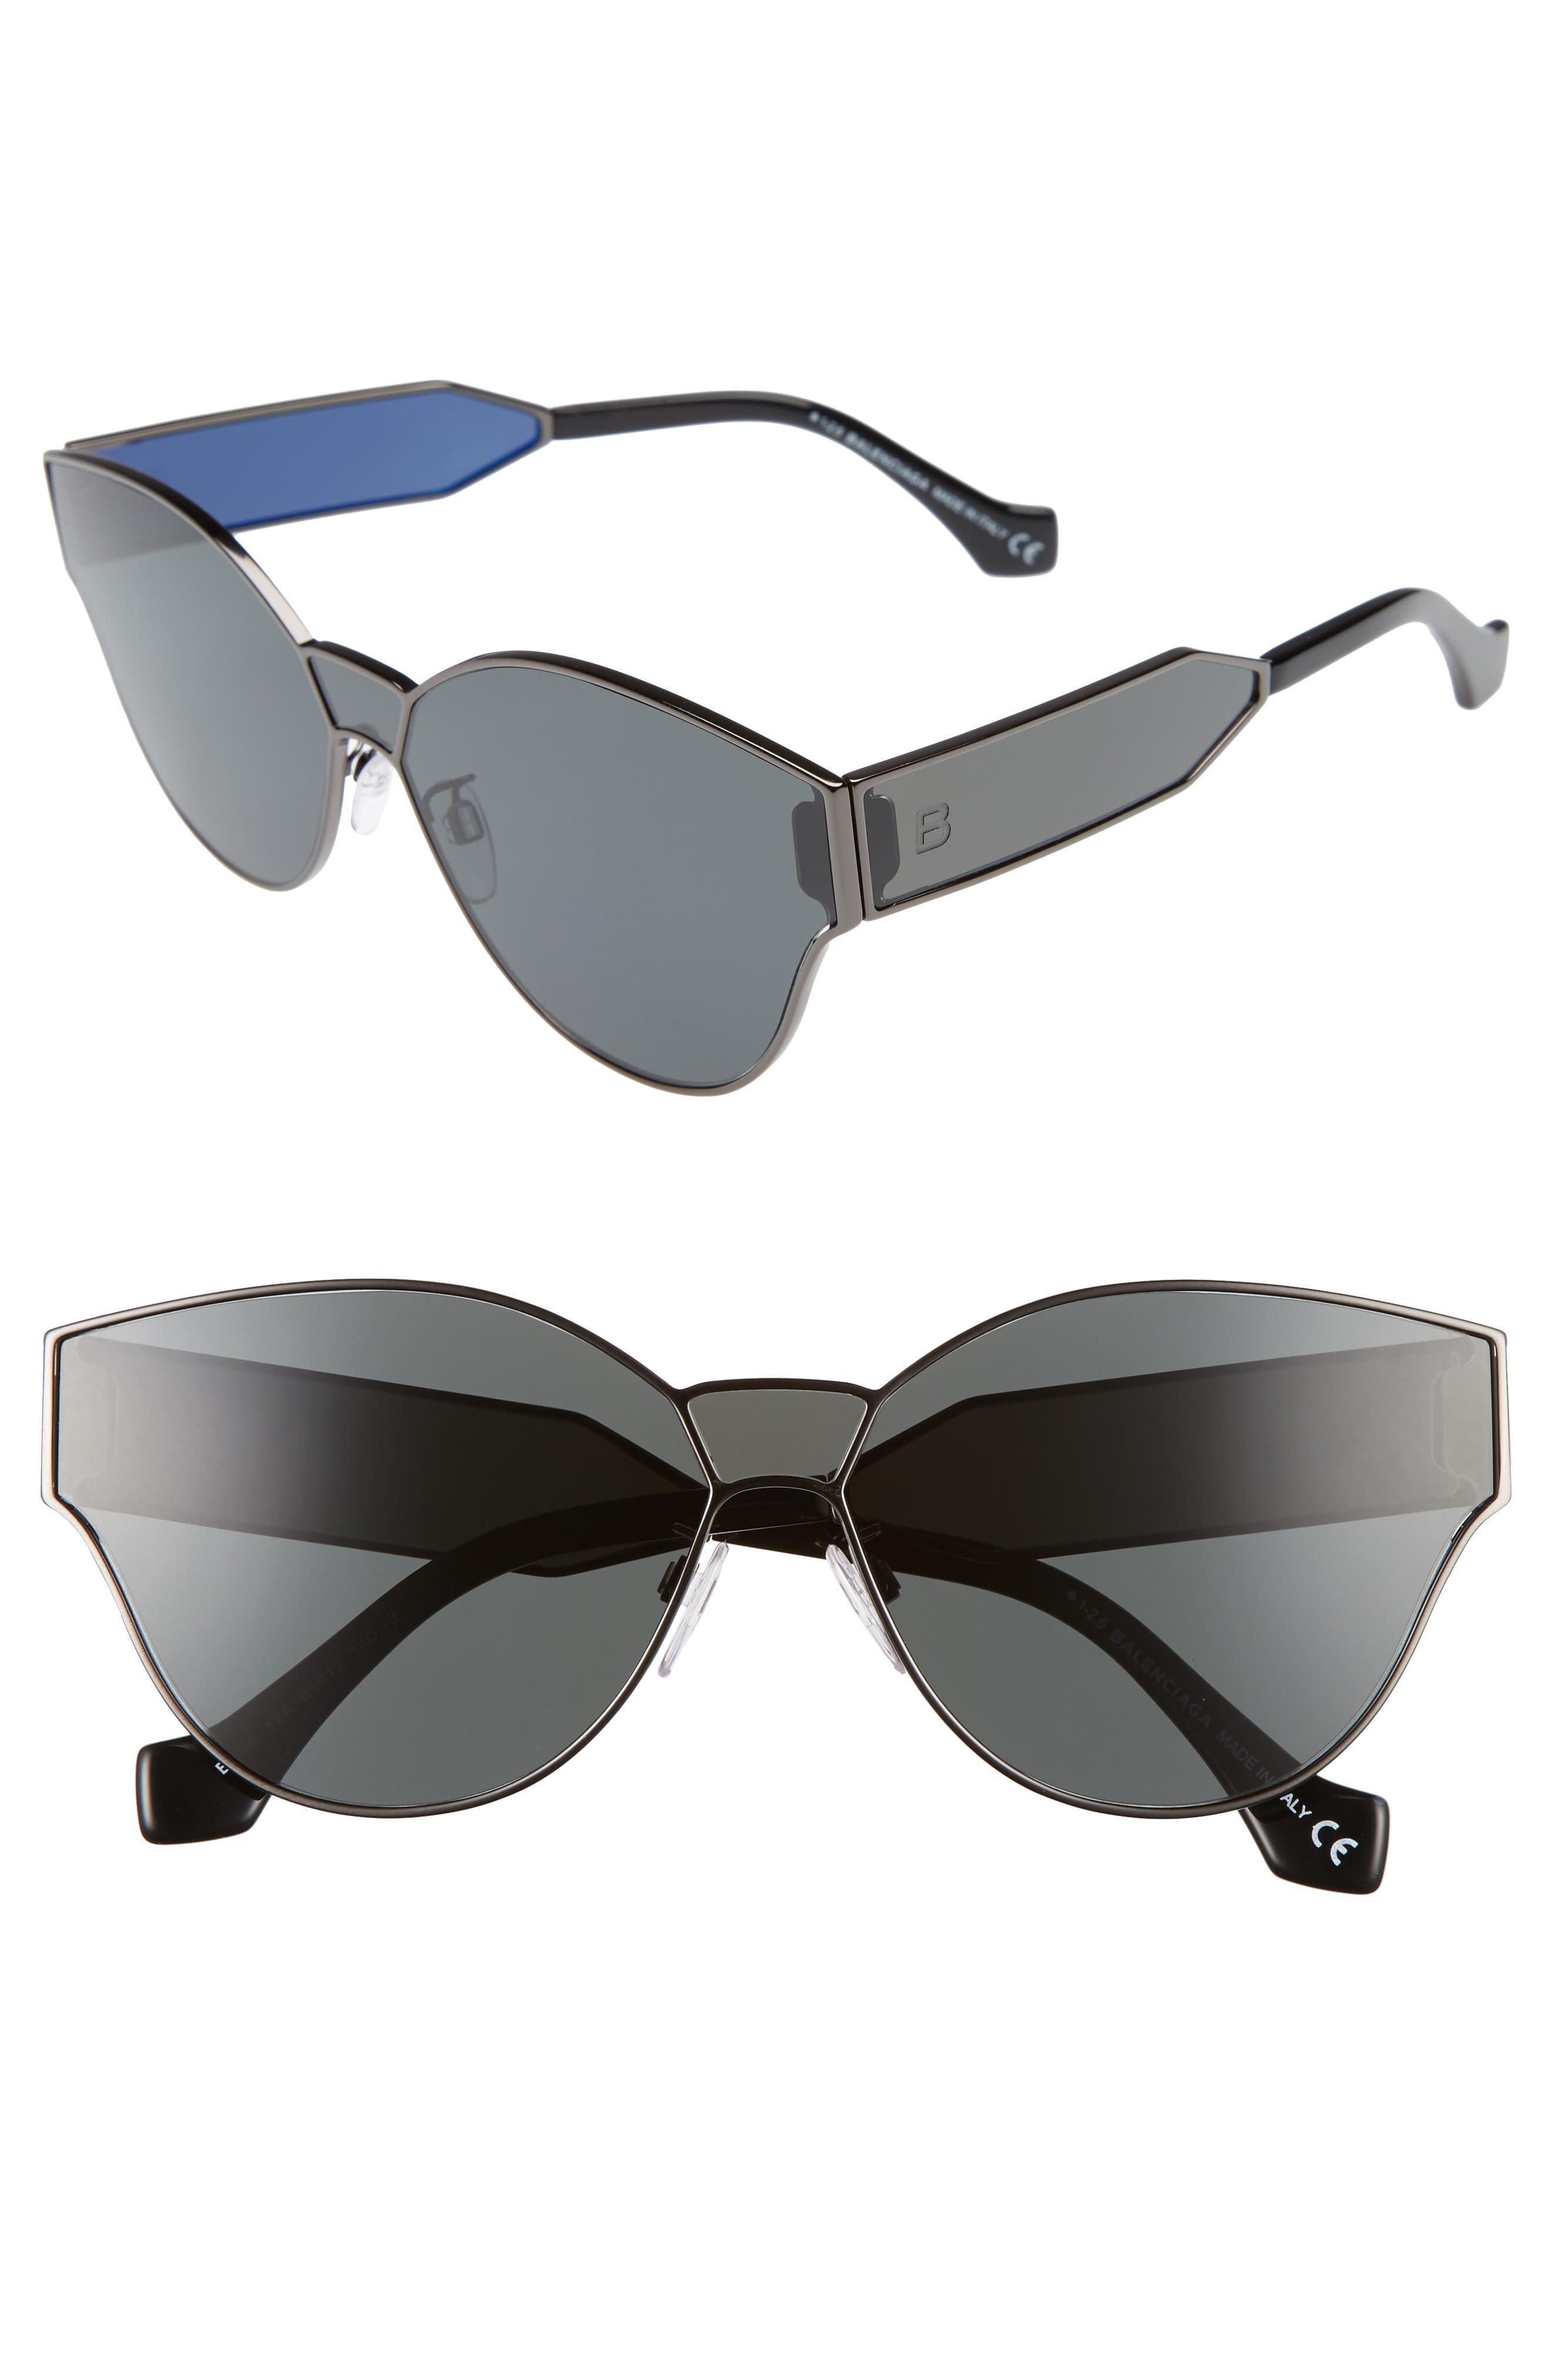 65mm Sunglasses,                             Main thumbnail 1, color,                             040